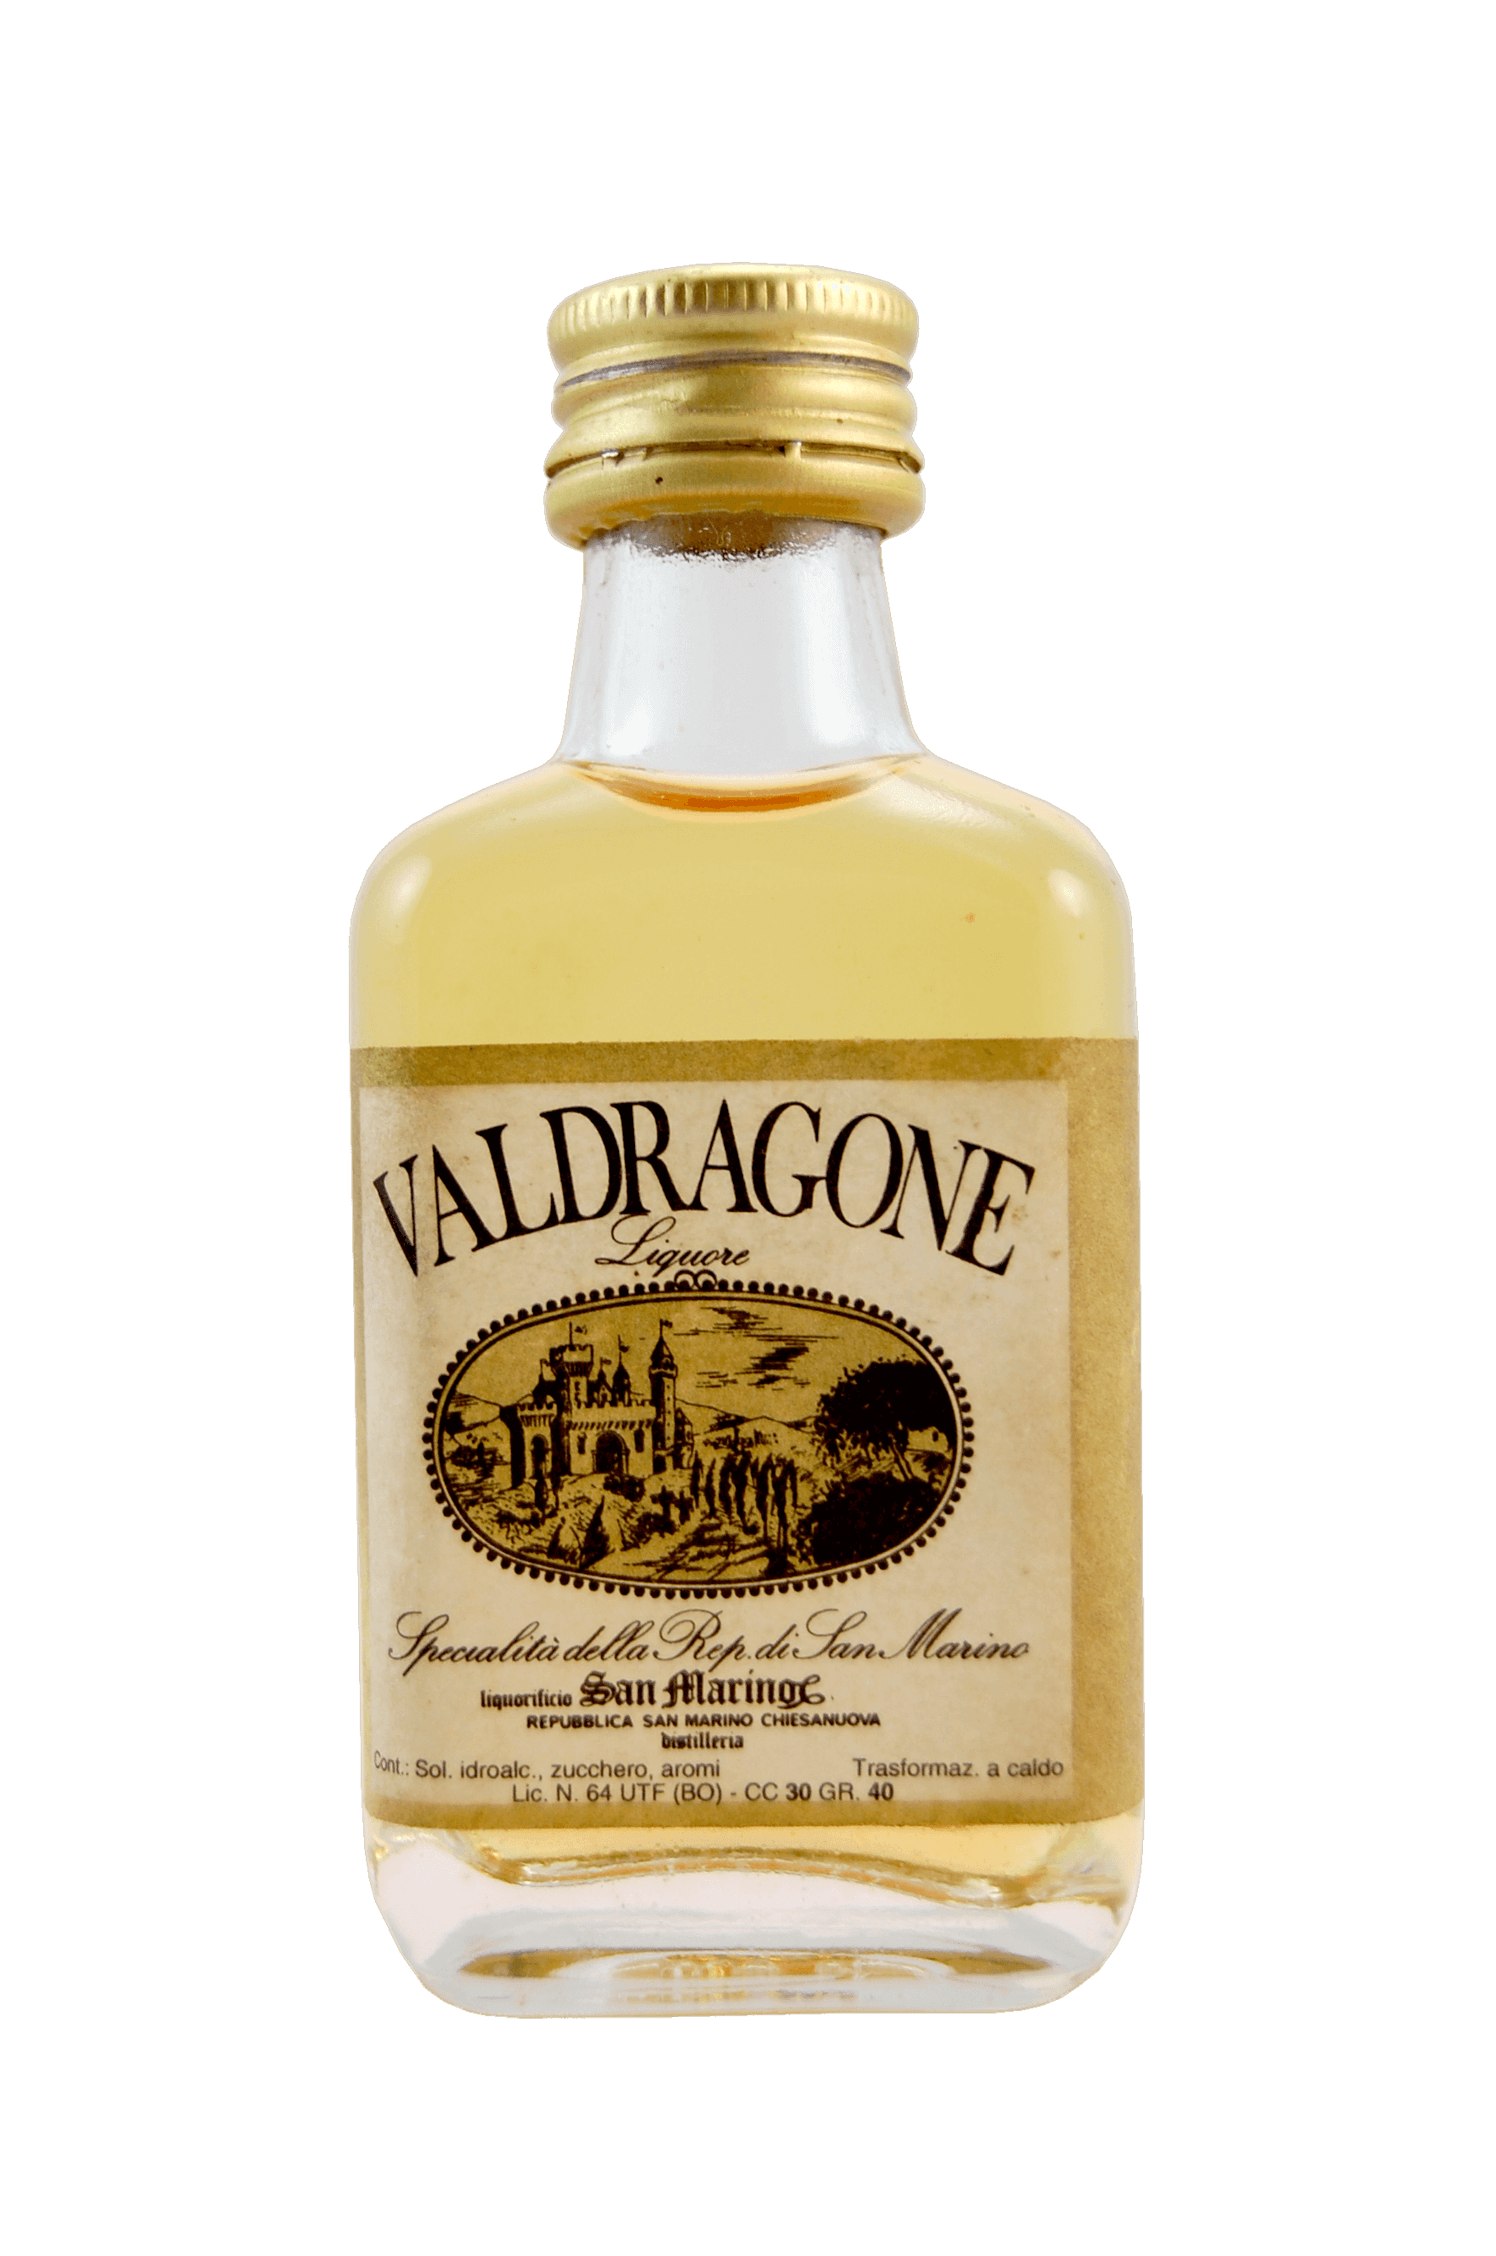 Valdragone